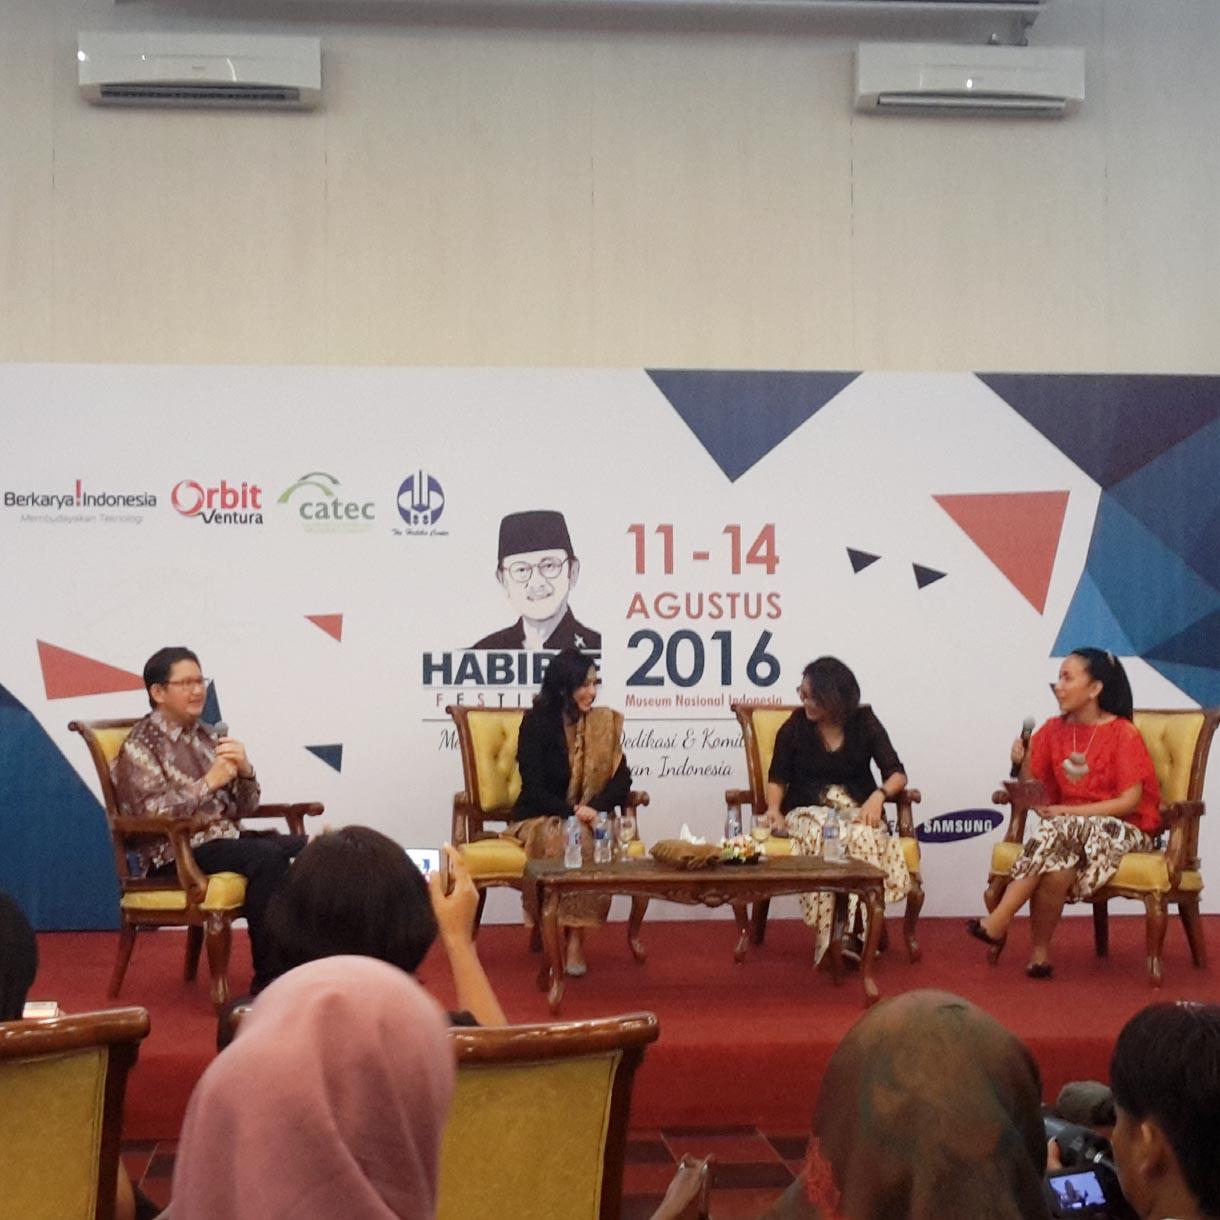 Batik Rudy Habibie by Batik Keris